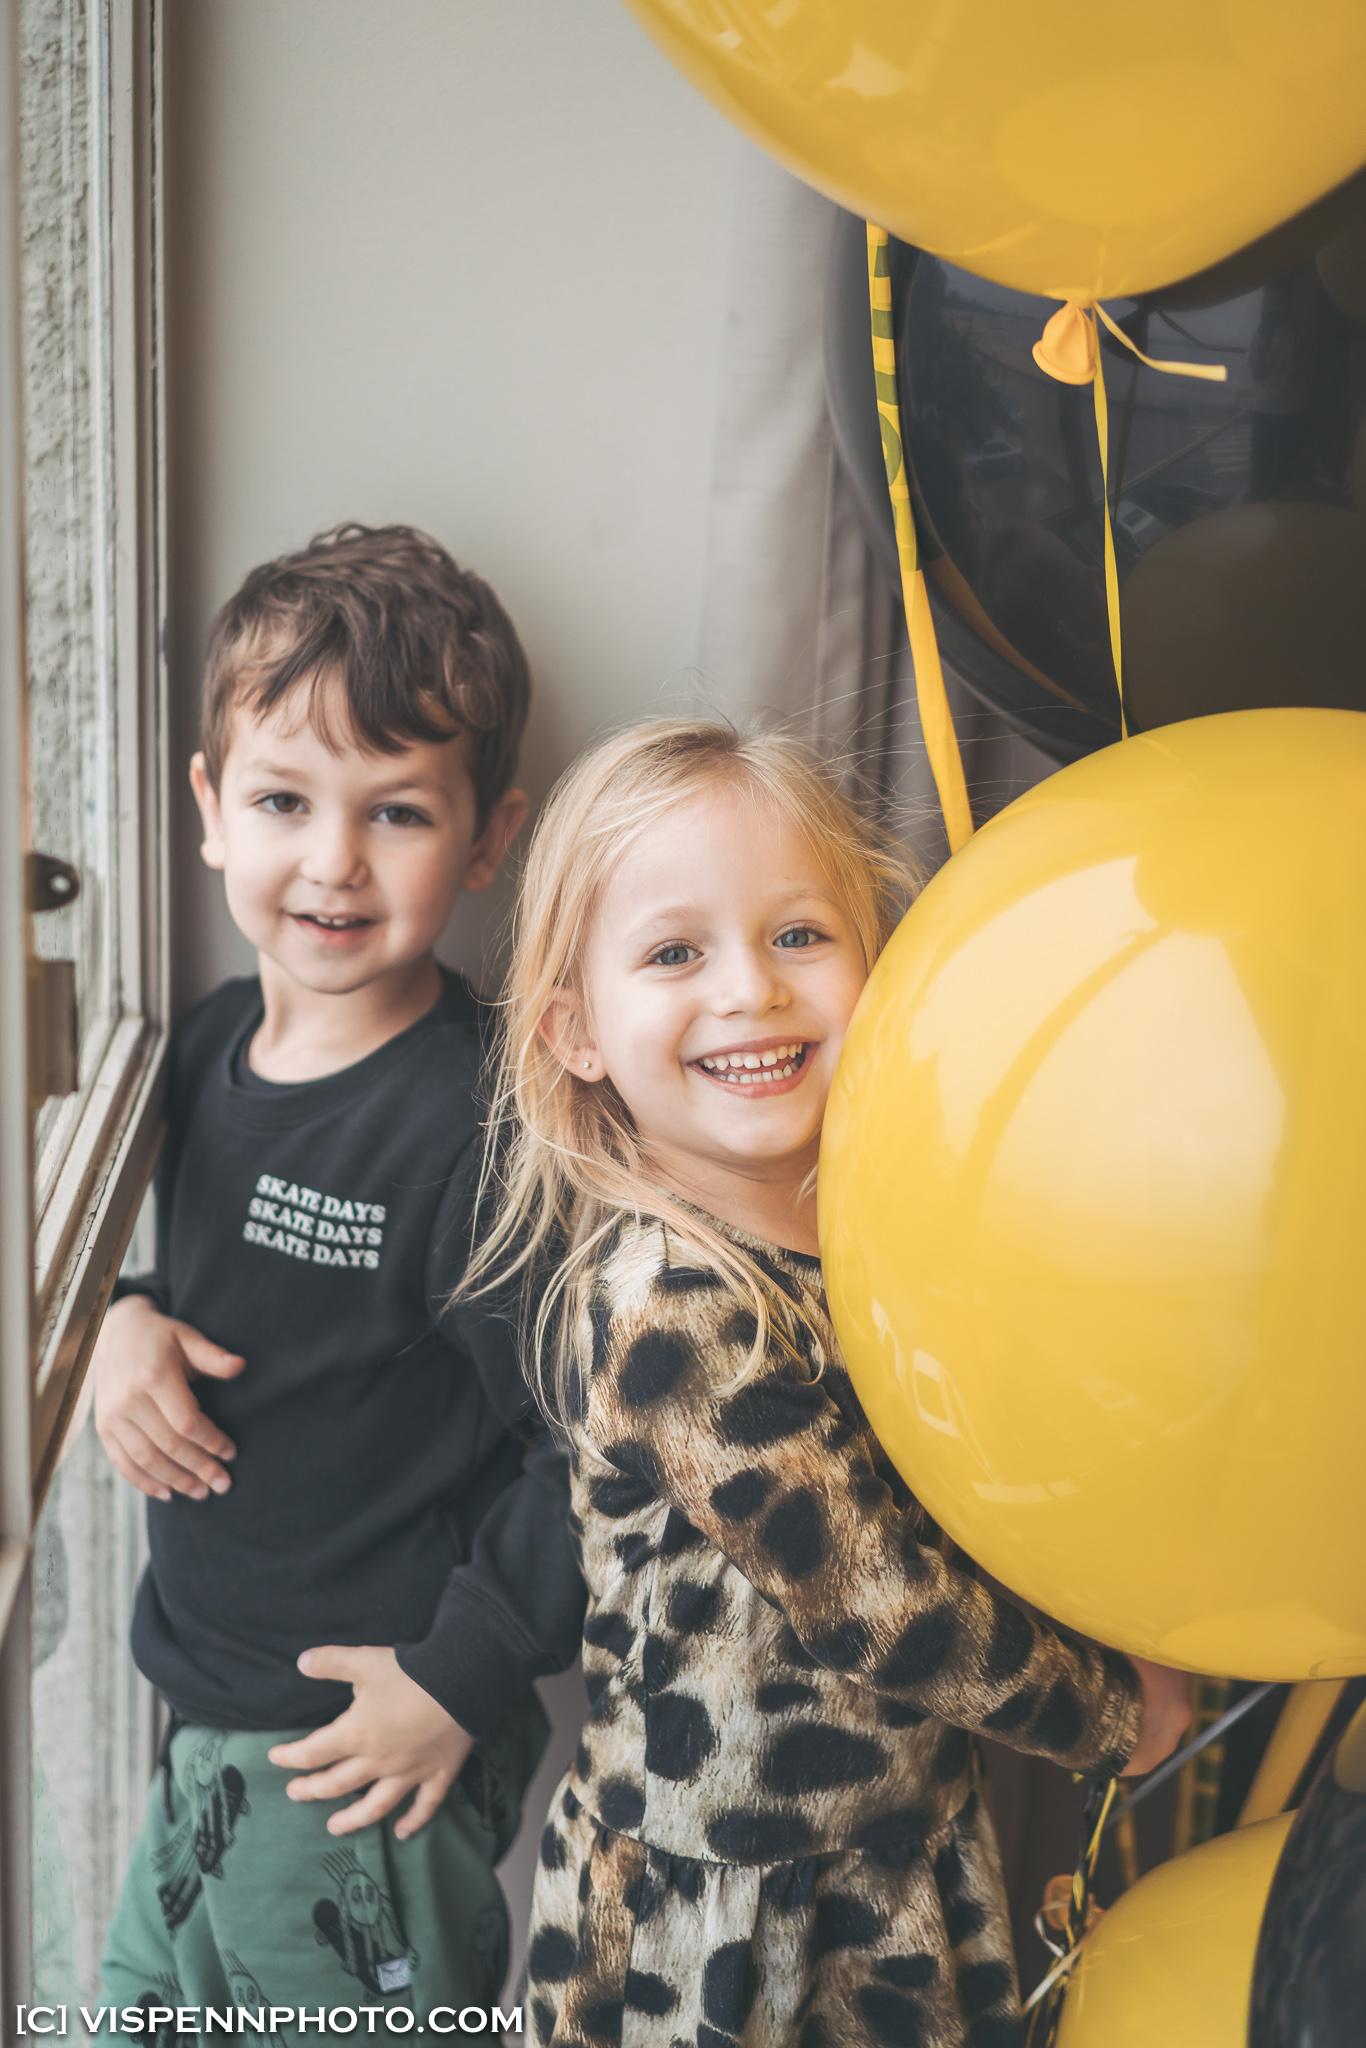 Melbourne Baby Family Birthday Party Photographer 墨尔本 百日宴 满月宴 周岁宴 摄影 VISPENN Austin 2678 Sony VISPENN